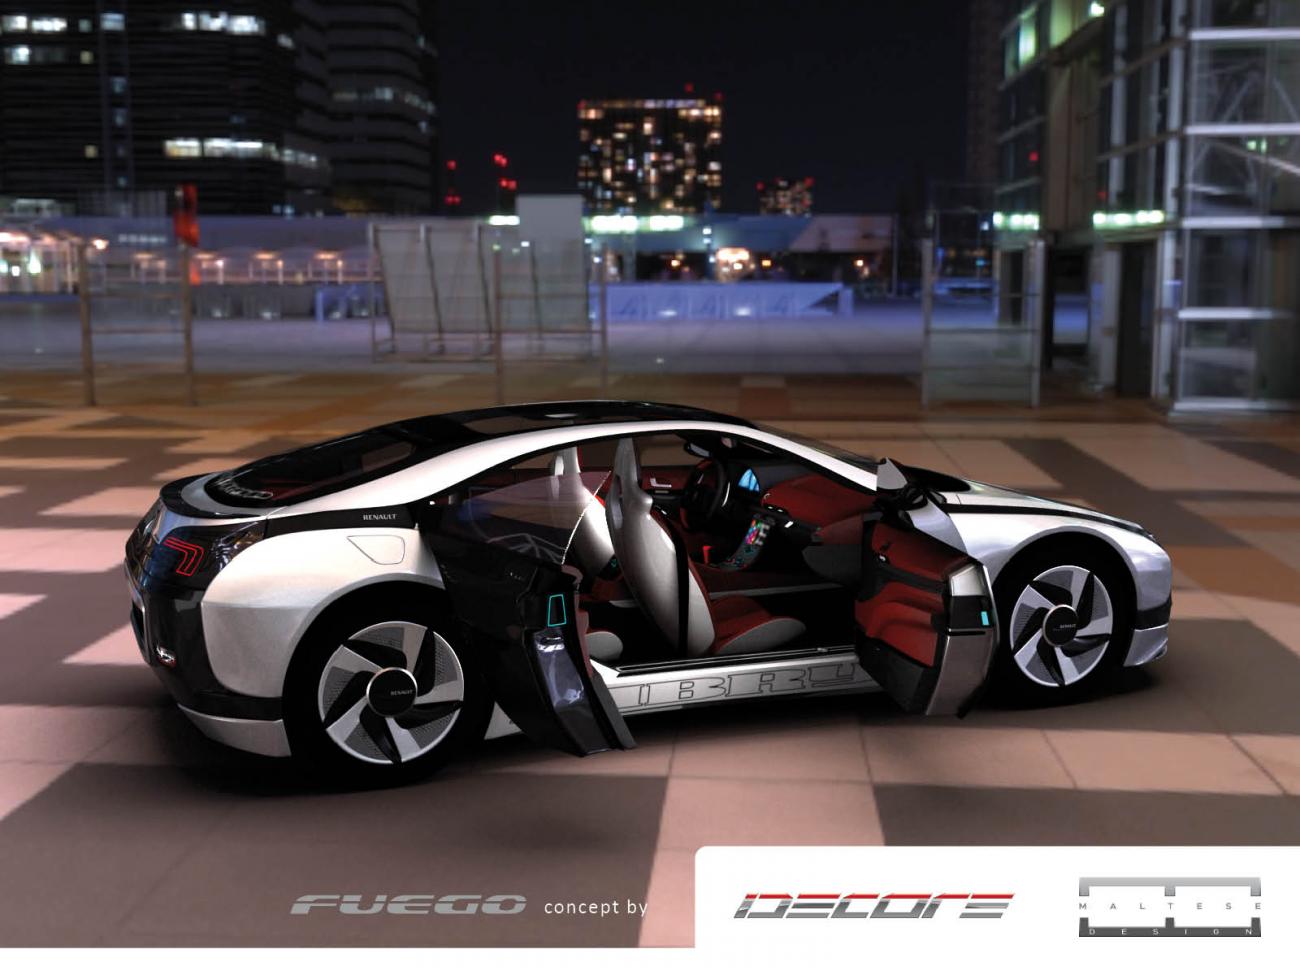 renault fuego concept la vision d 39 idecore blog automobile. Black Bedroom Furniture Sets. Home Design Ideas